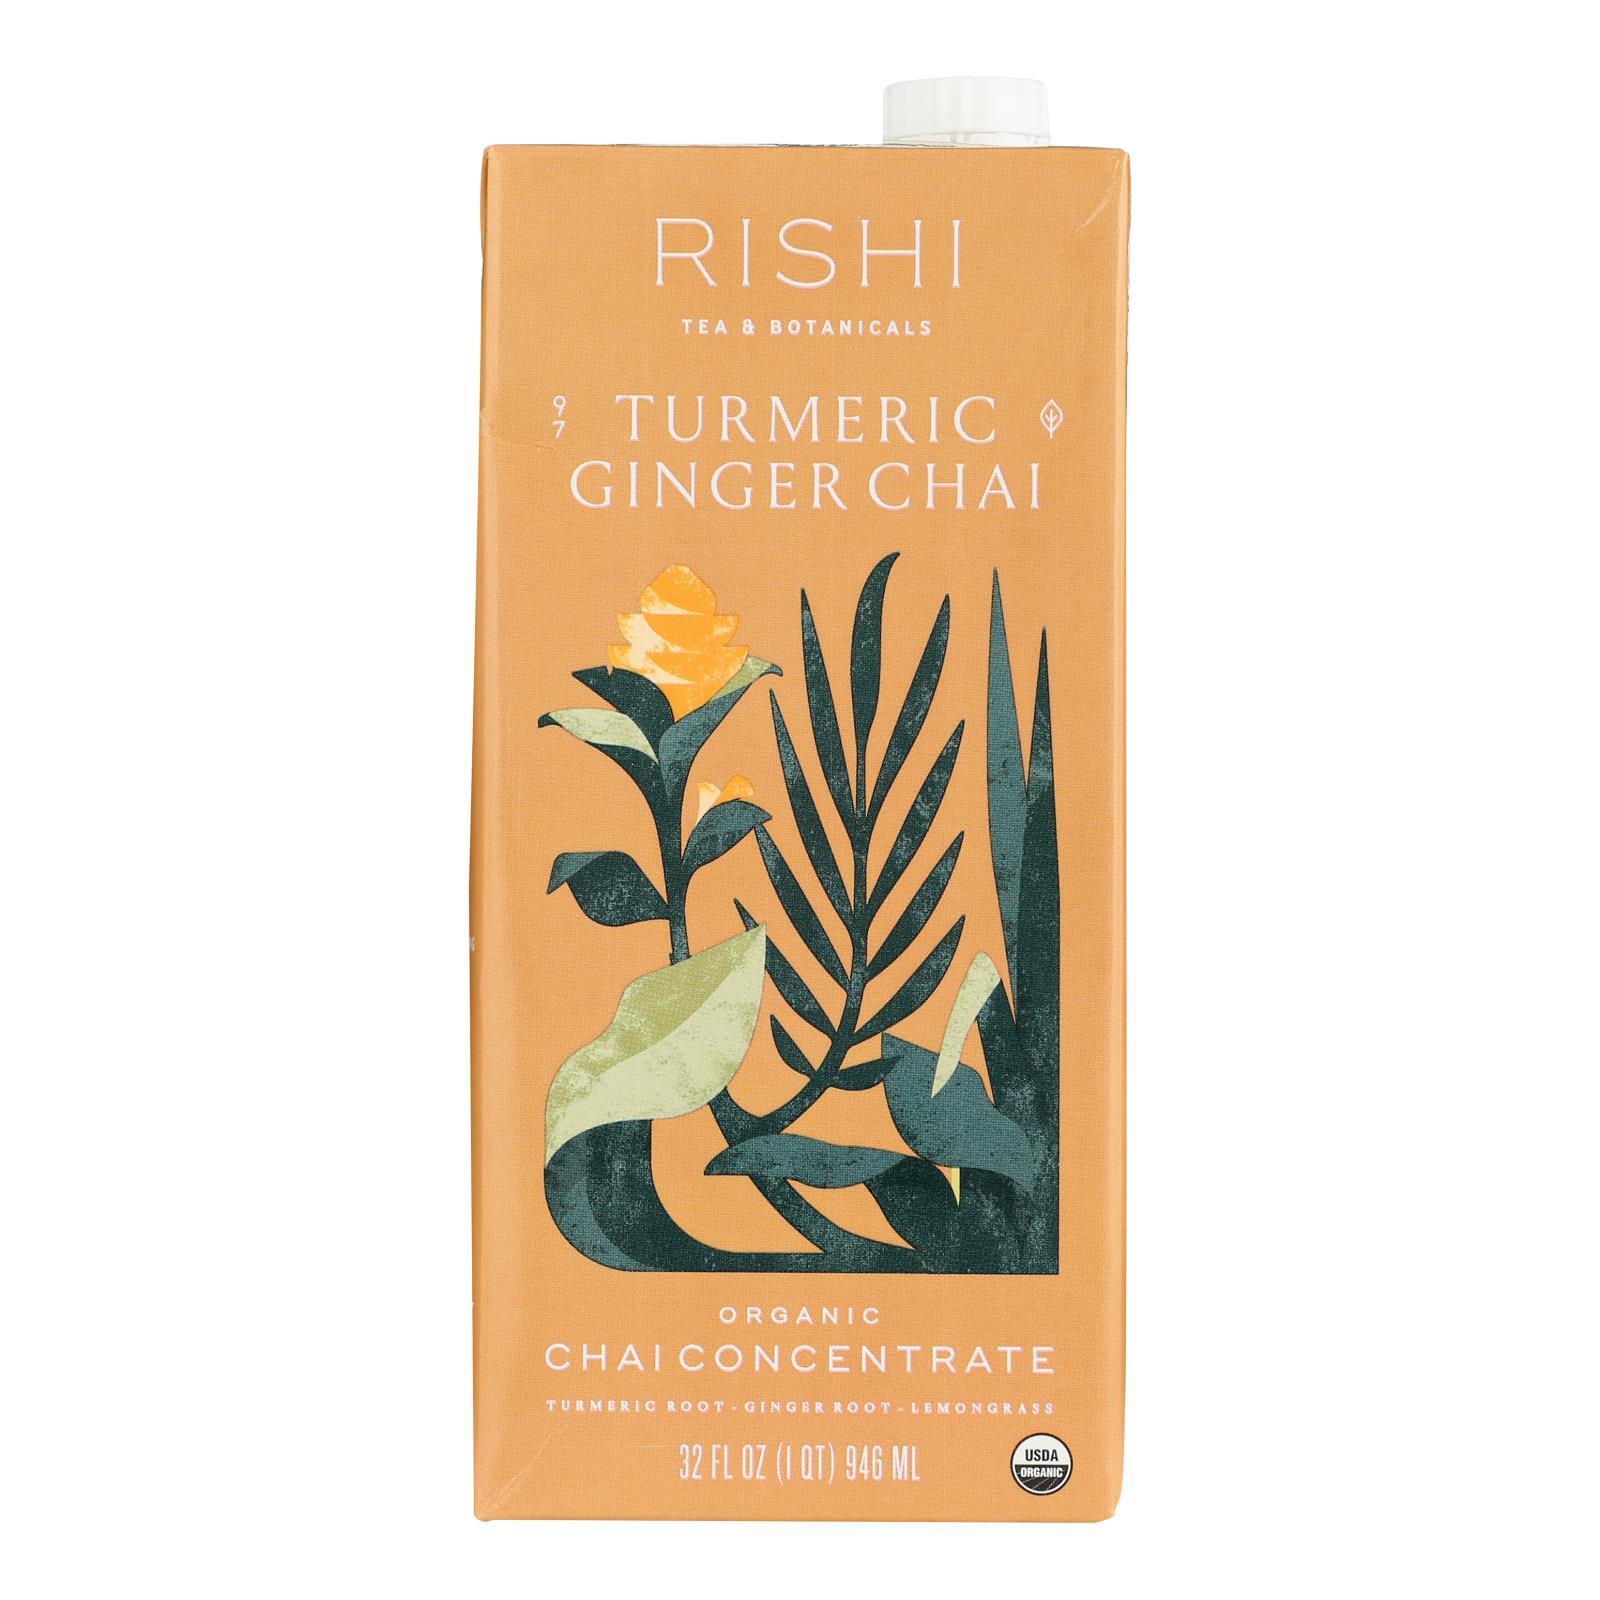 Rishi Chai Concentrate - Turmeric Ginger - Case of 12 - 32 Fl oz.